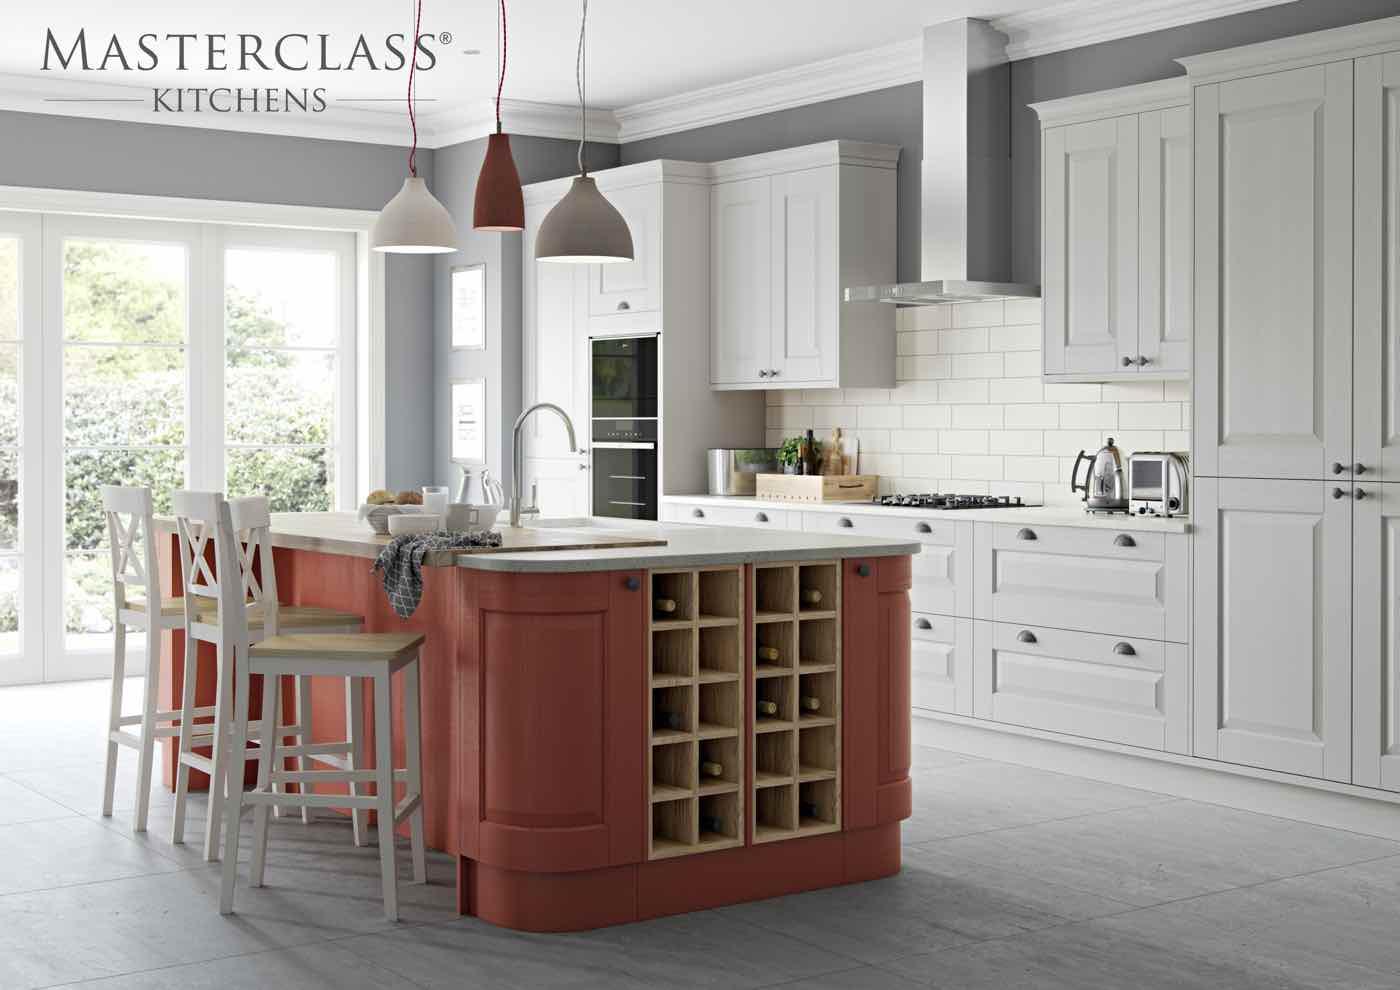 masterclass Carnegie kitchen range